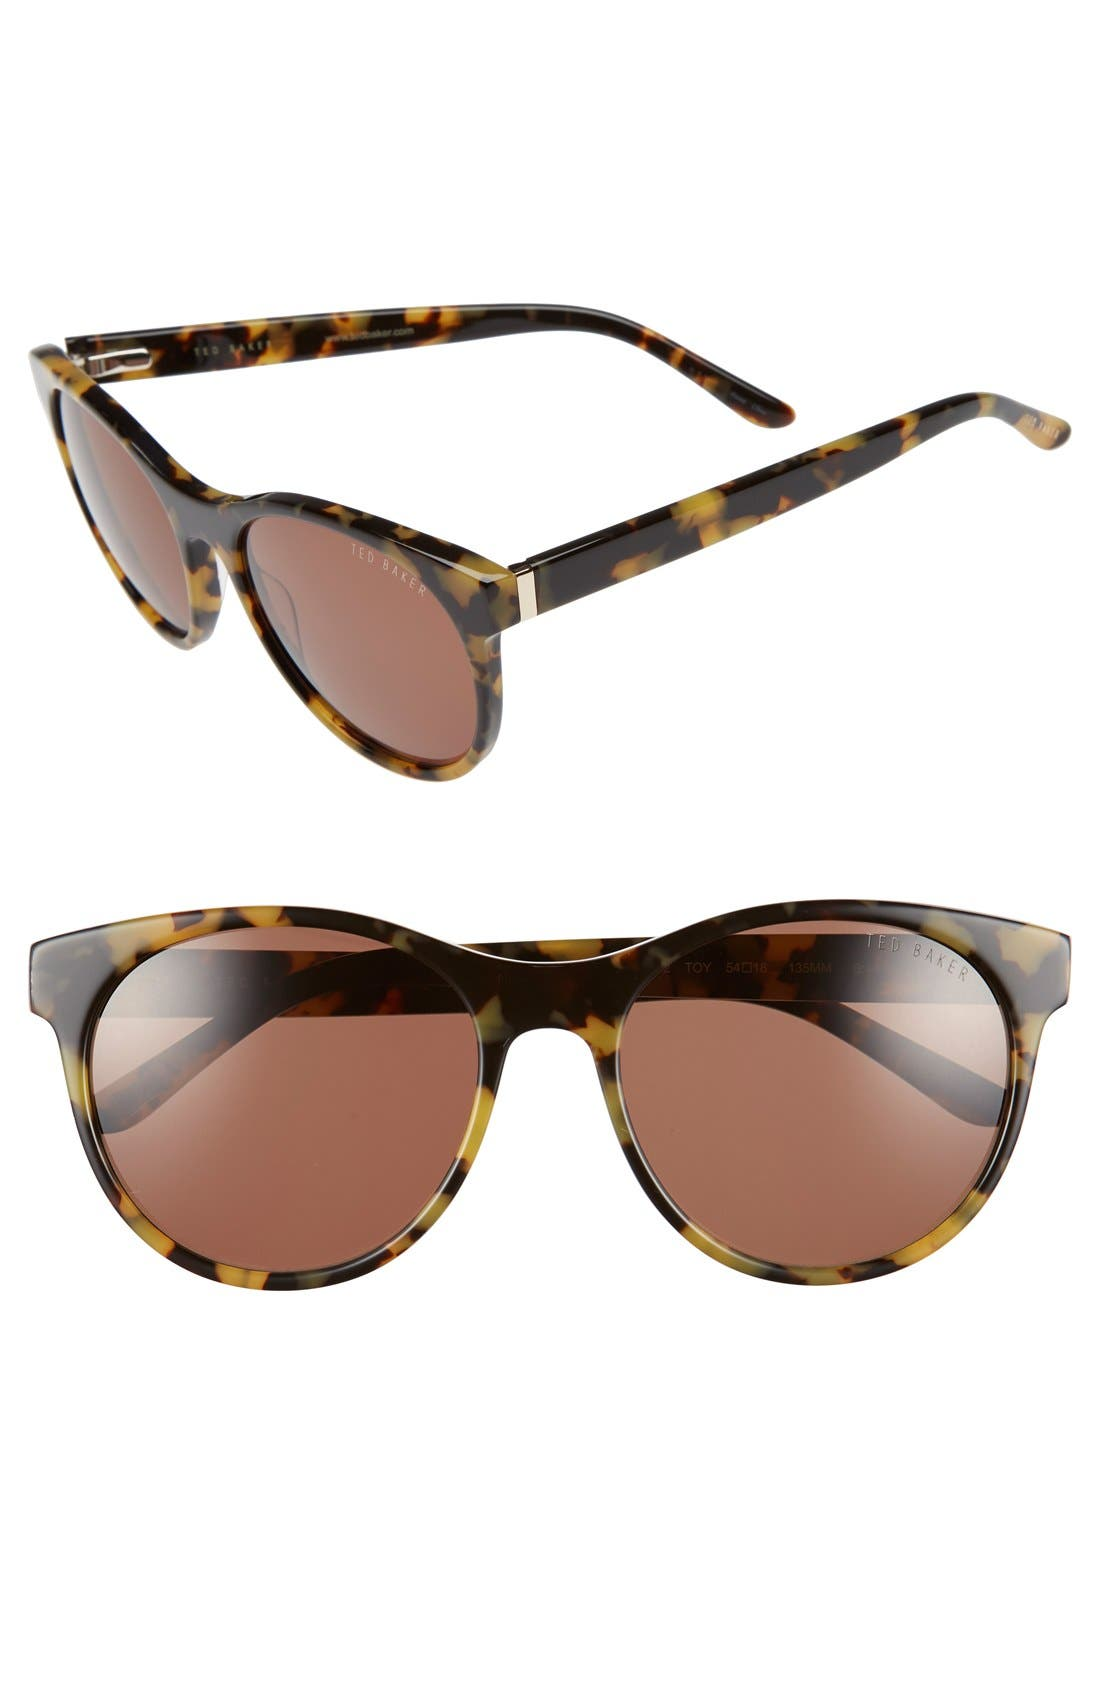 TED BAKER LONDON 54mm Retro Sunglasses